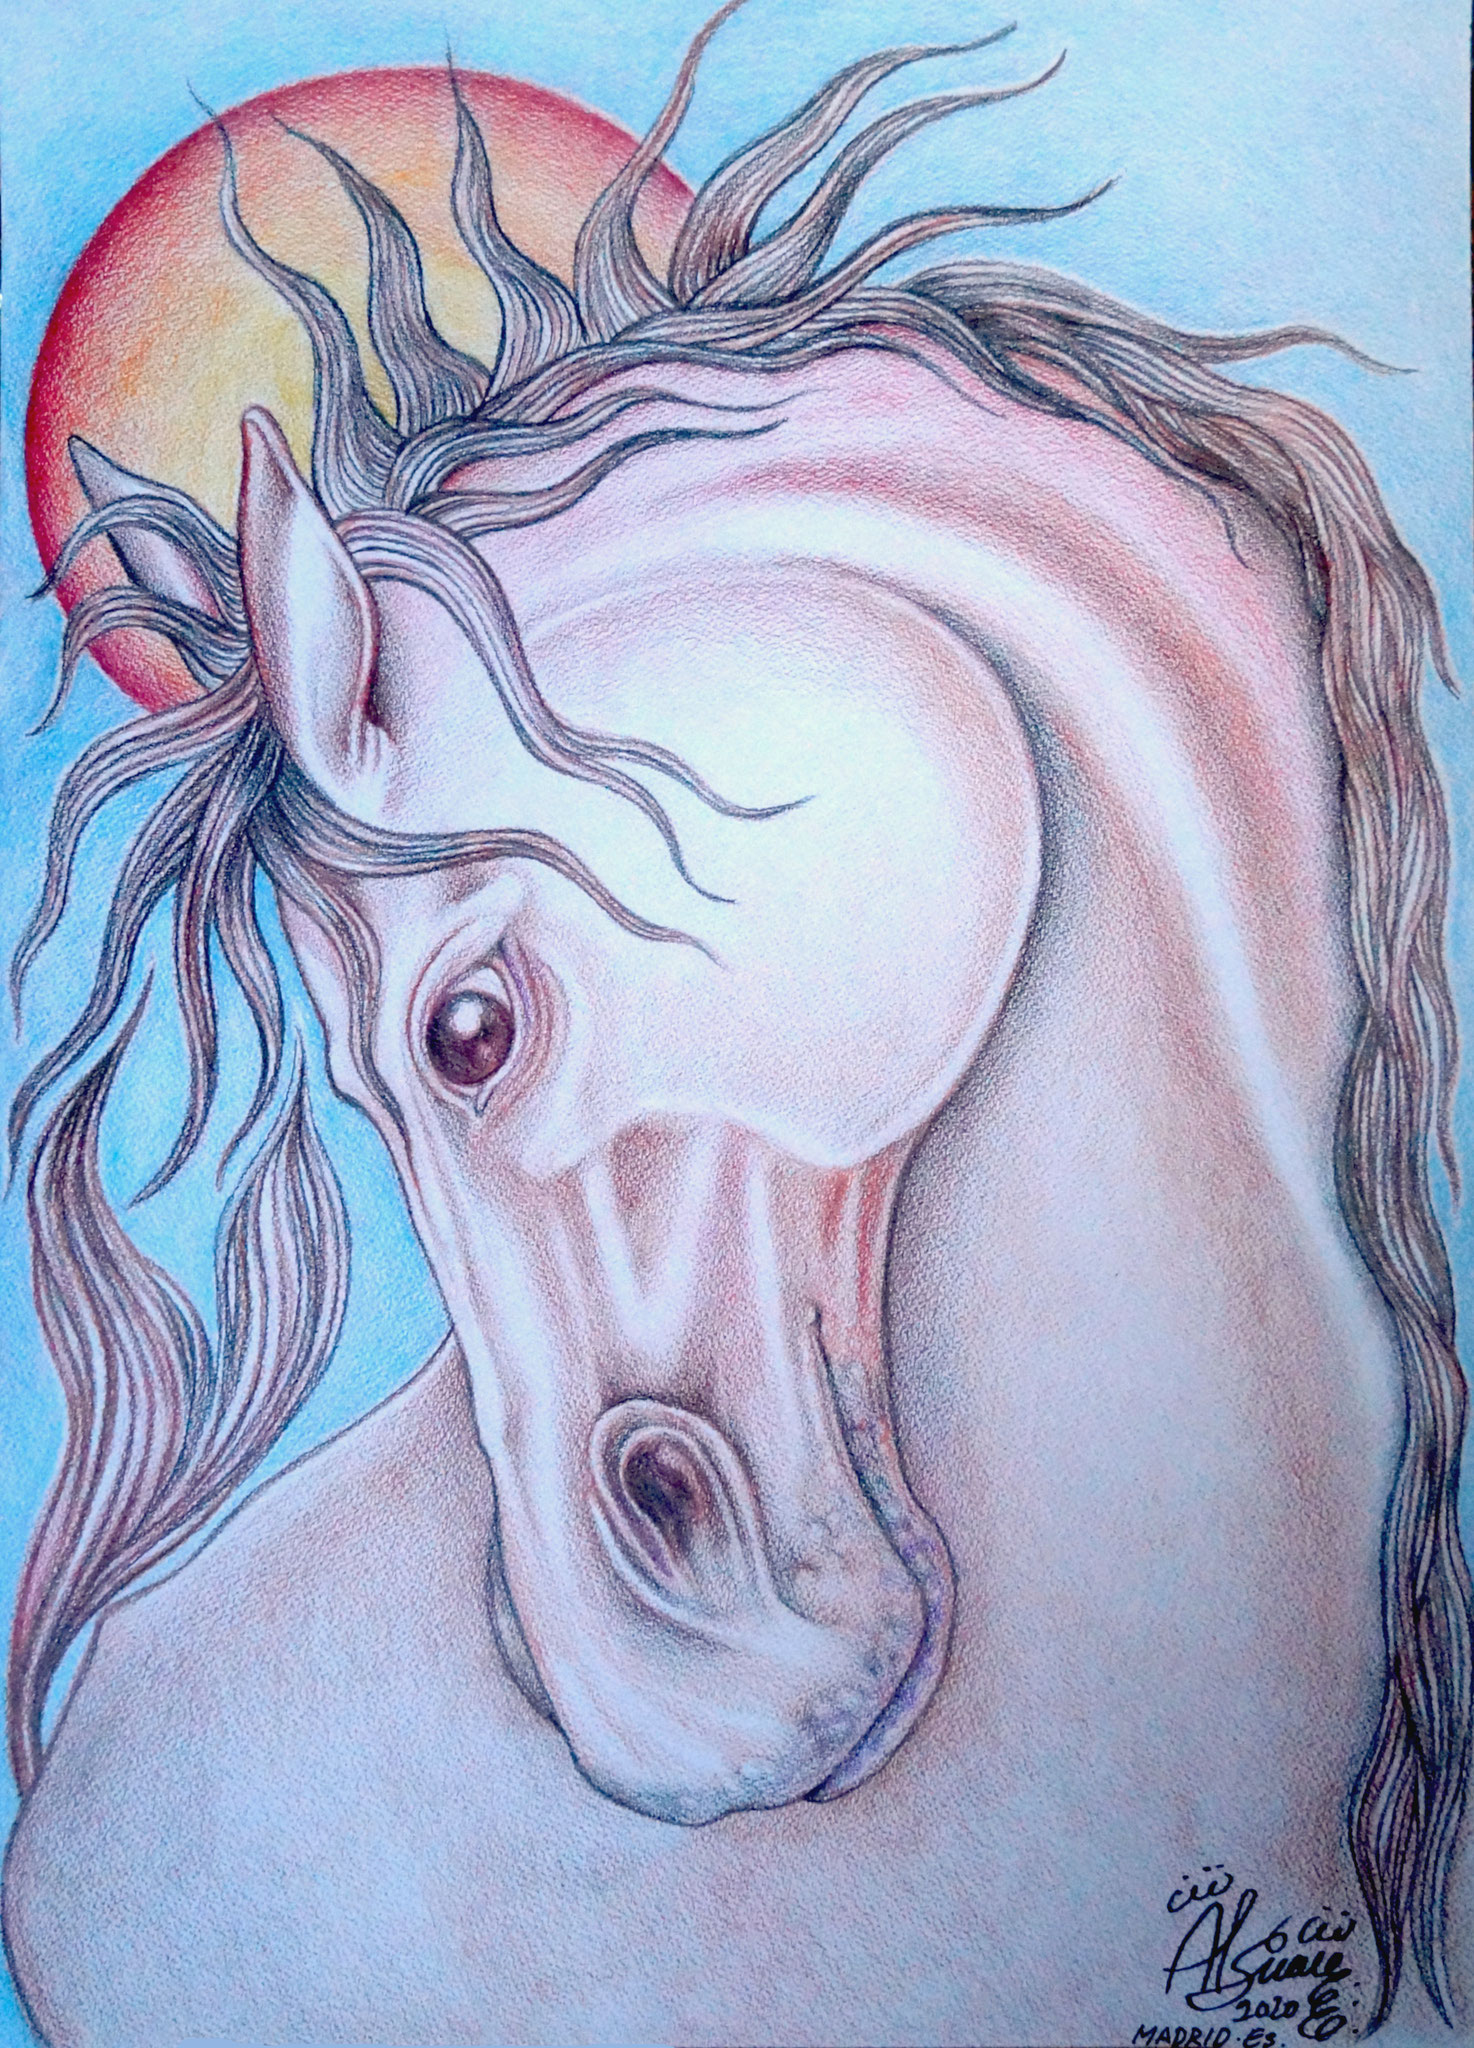 Cabeza de caballo / Técnica mixta / 42 x 29, 7 cm / 2020